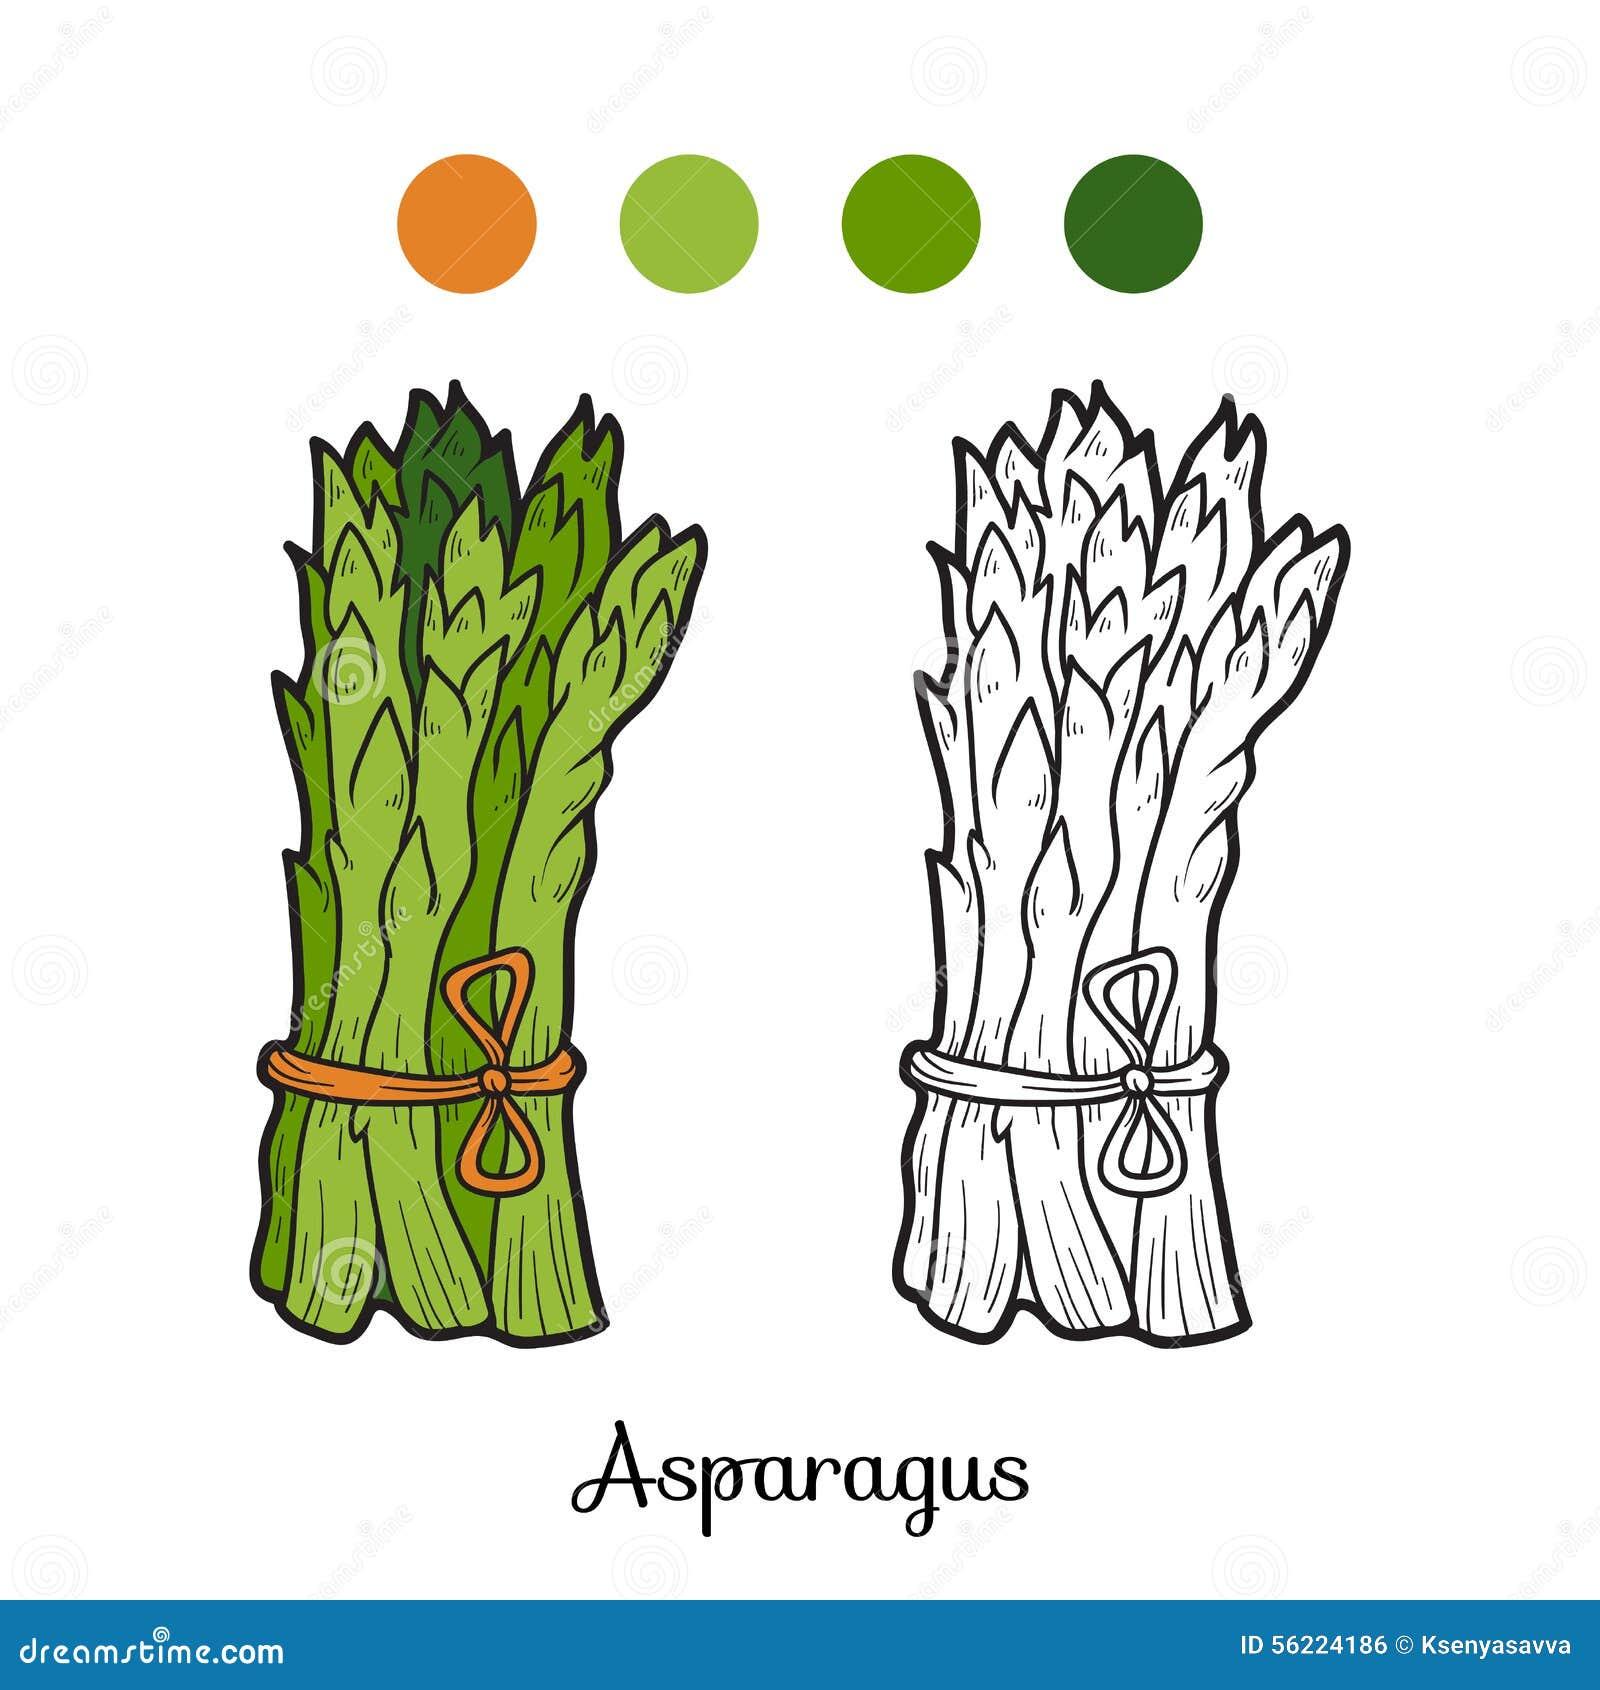 Asparagus Stock Illustrations – 3,661 Asparagus Stock Illustrations ...